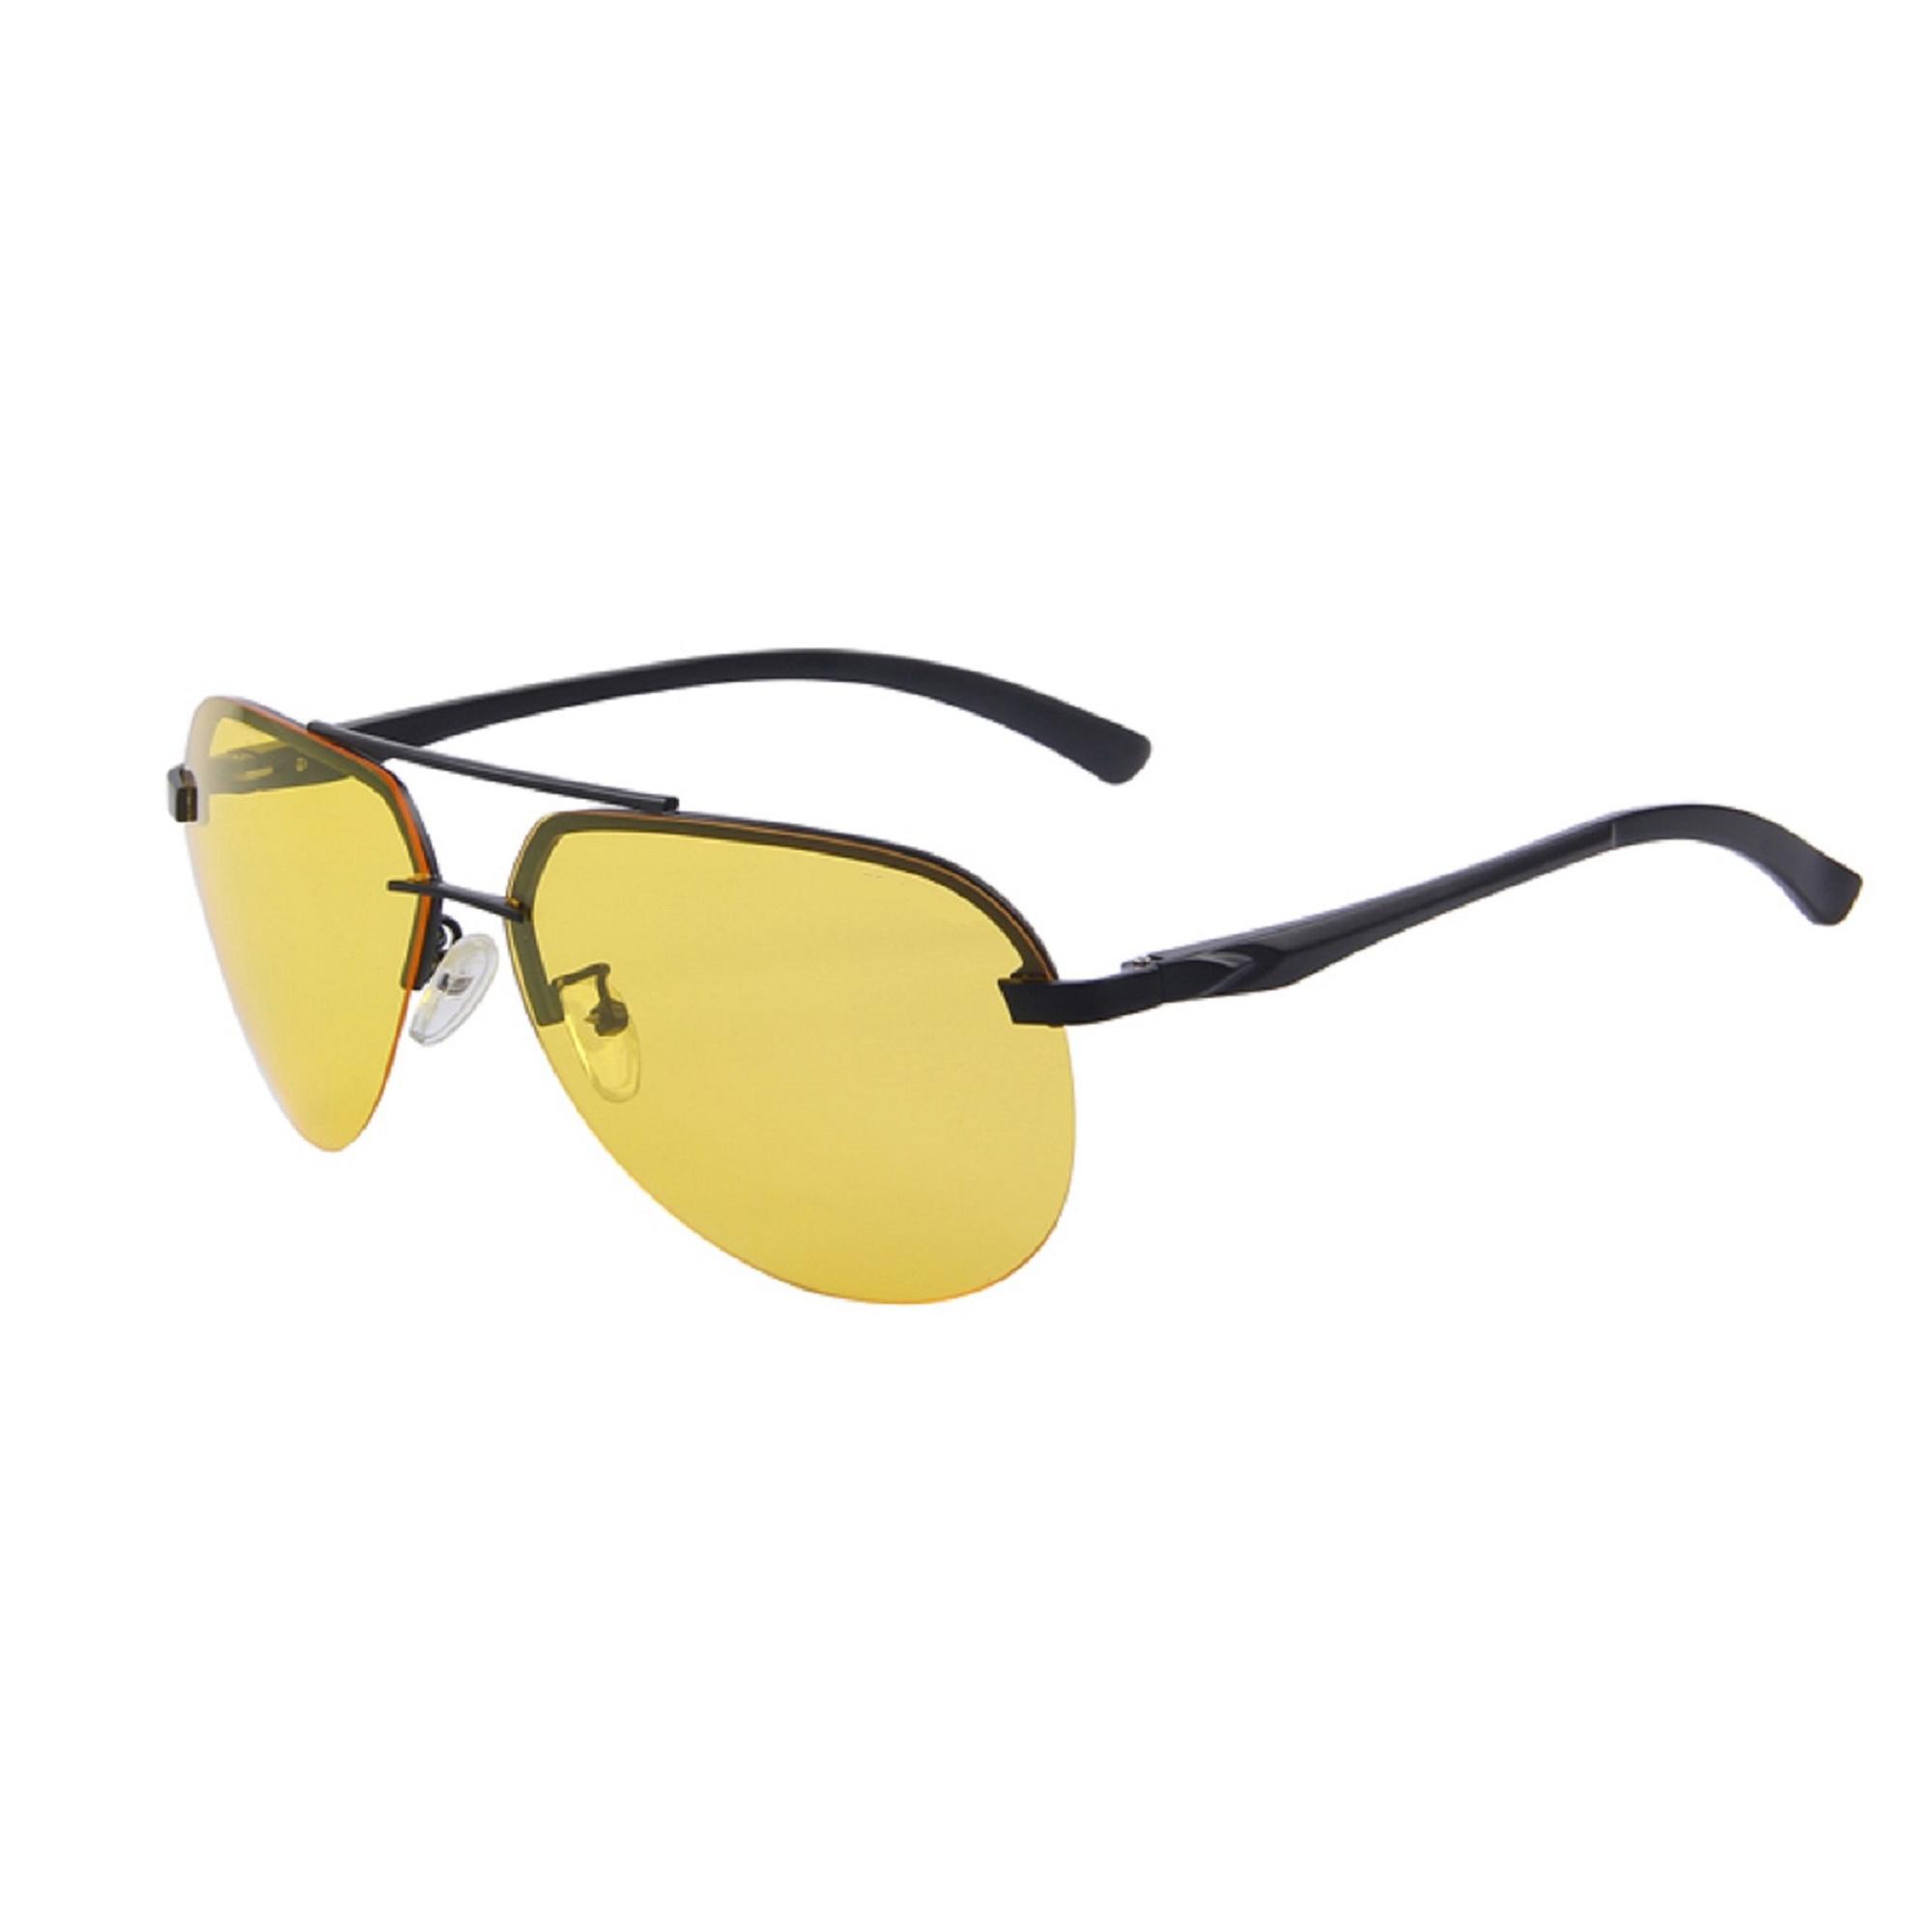 HD Vision Night Driving Polarized Aviator Sunglasses